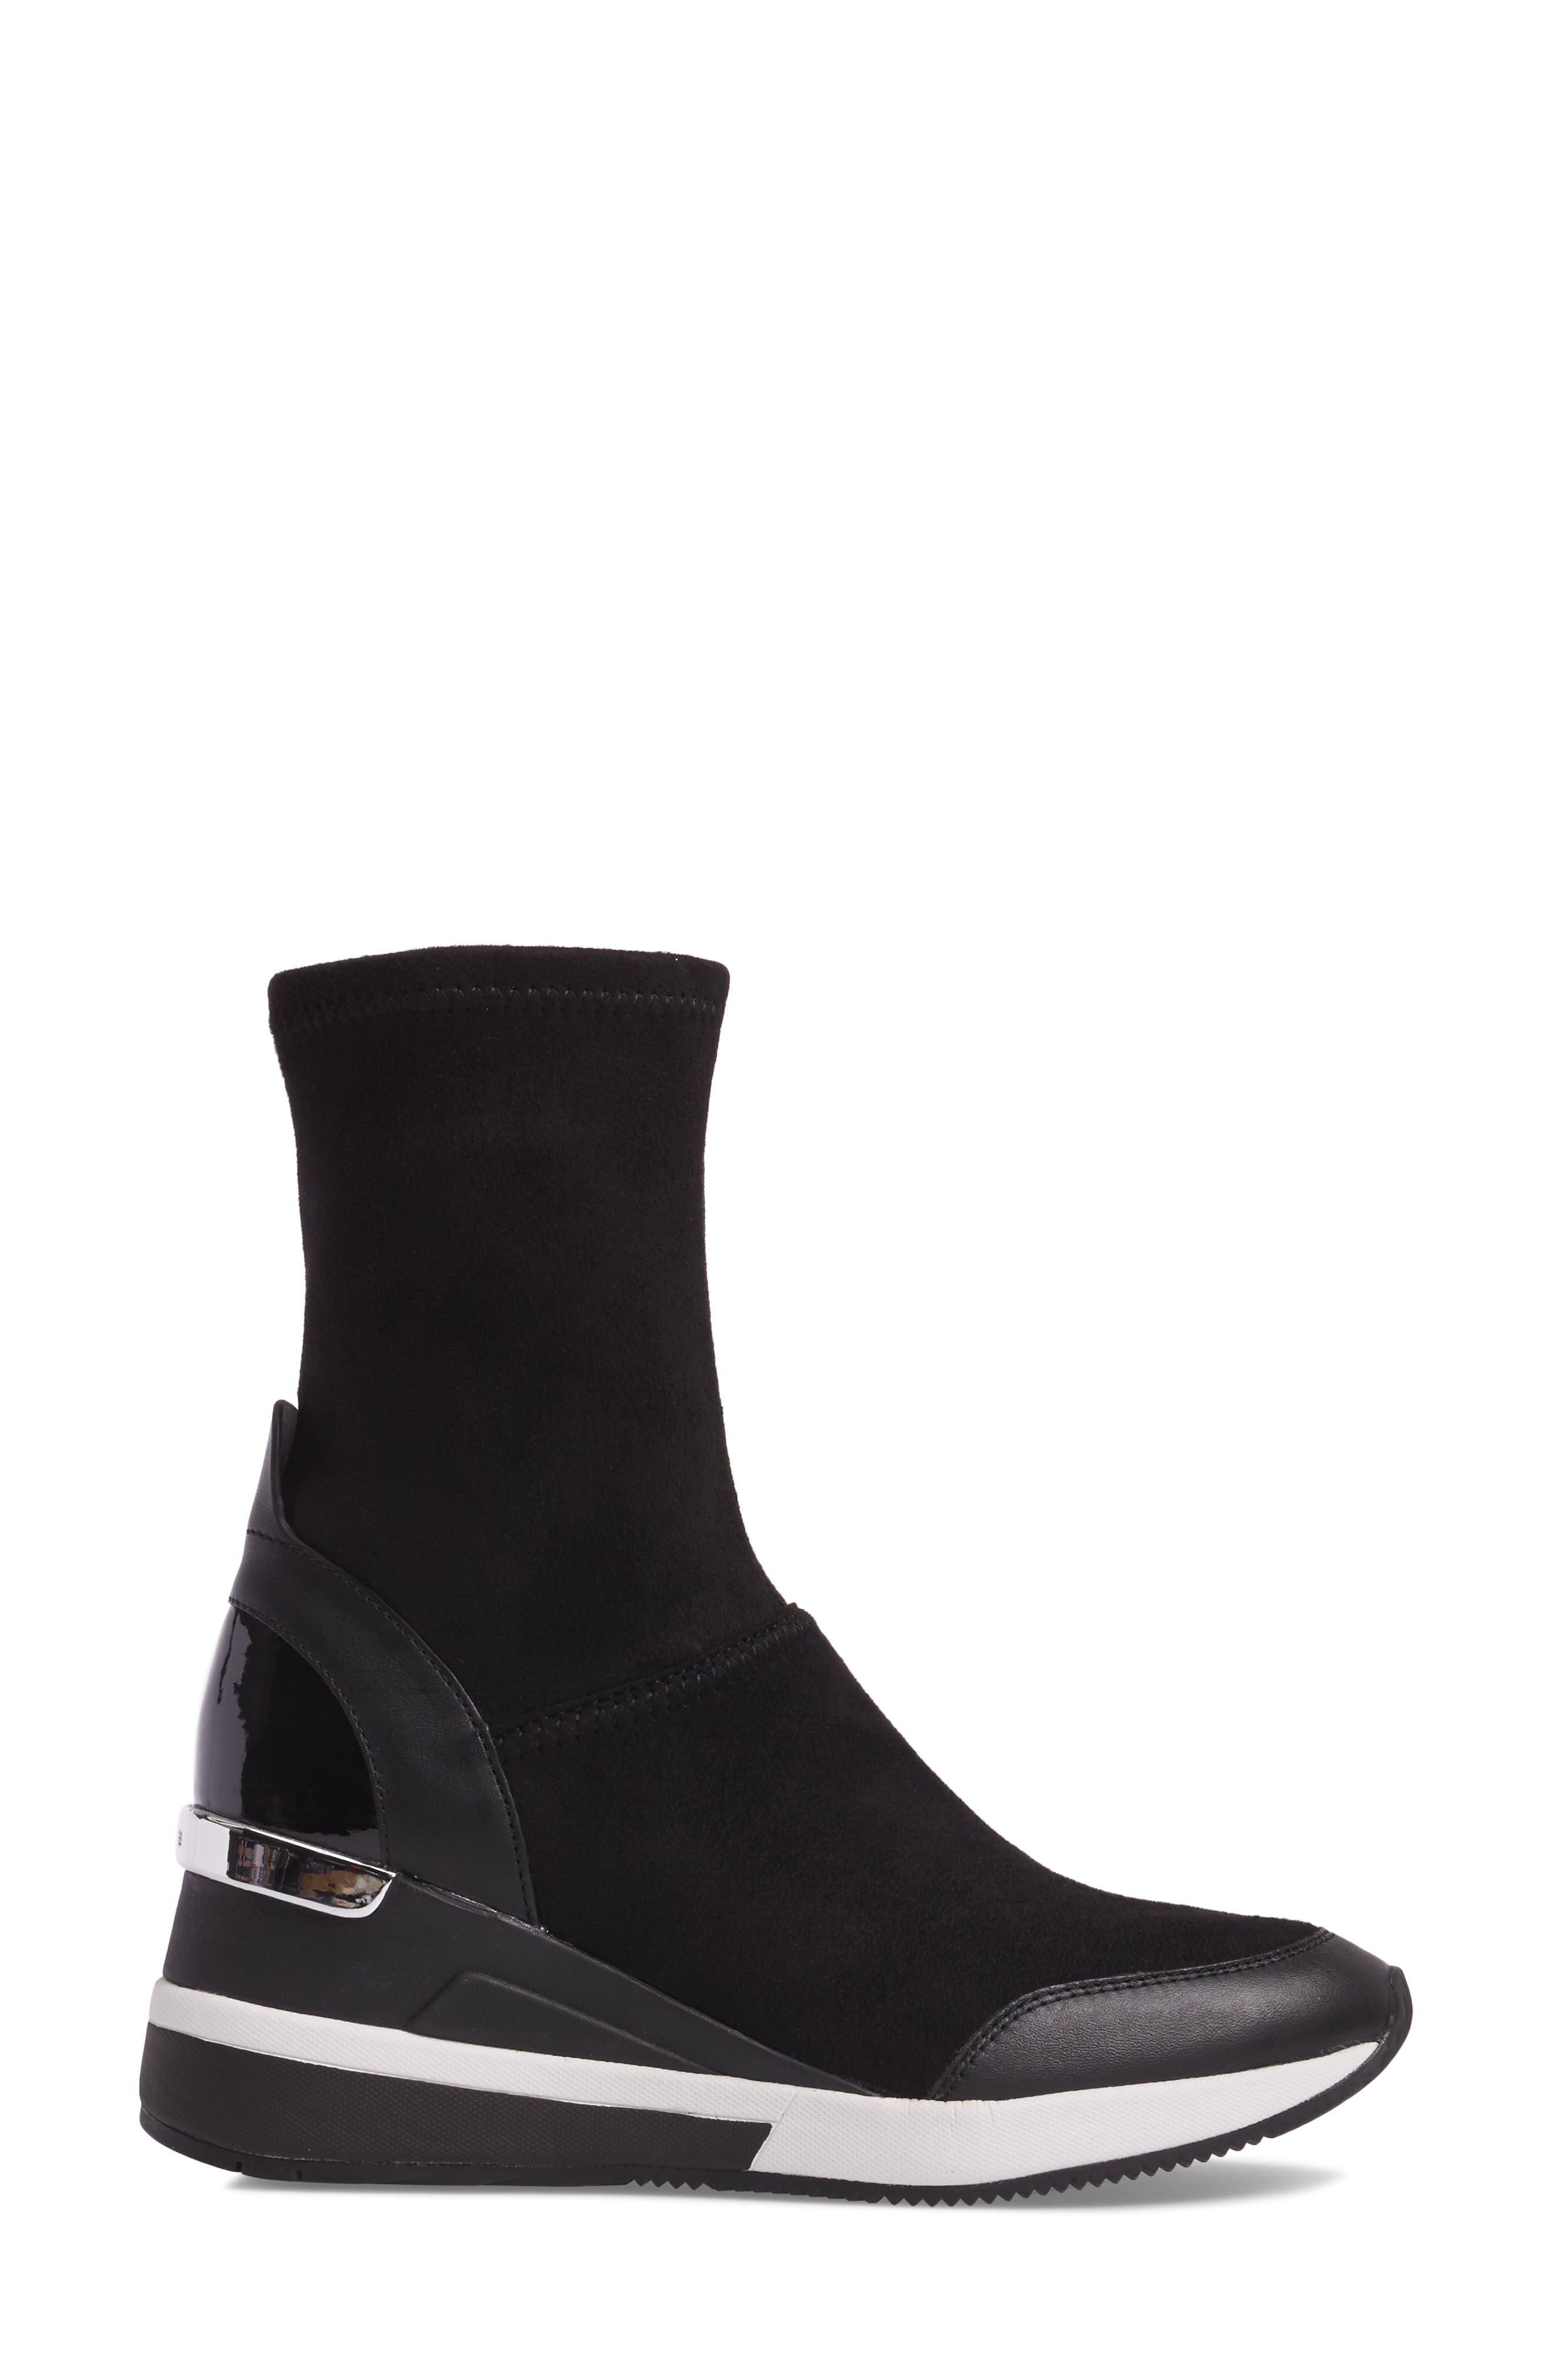 'Ace' Wedge Sneaker Bootie,                             Alternate thumbnail 3, color,                             BLACK SUEDE